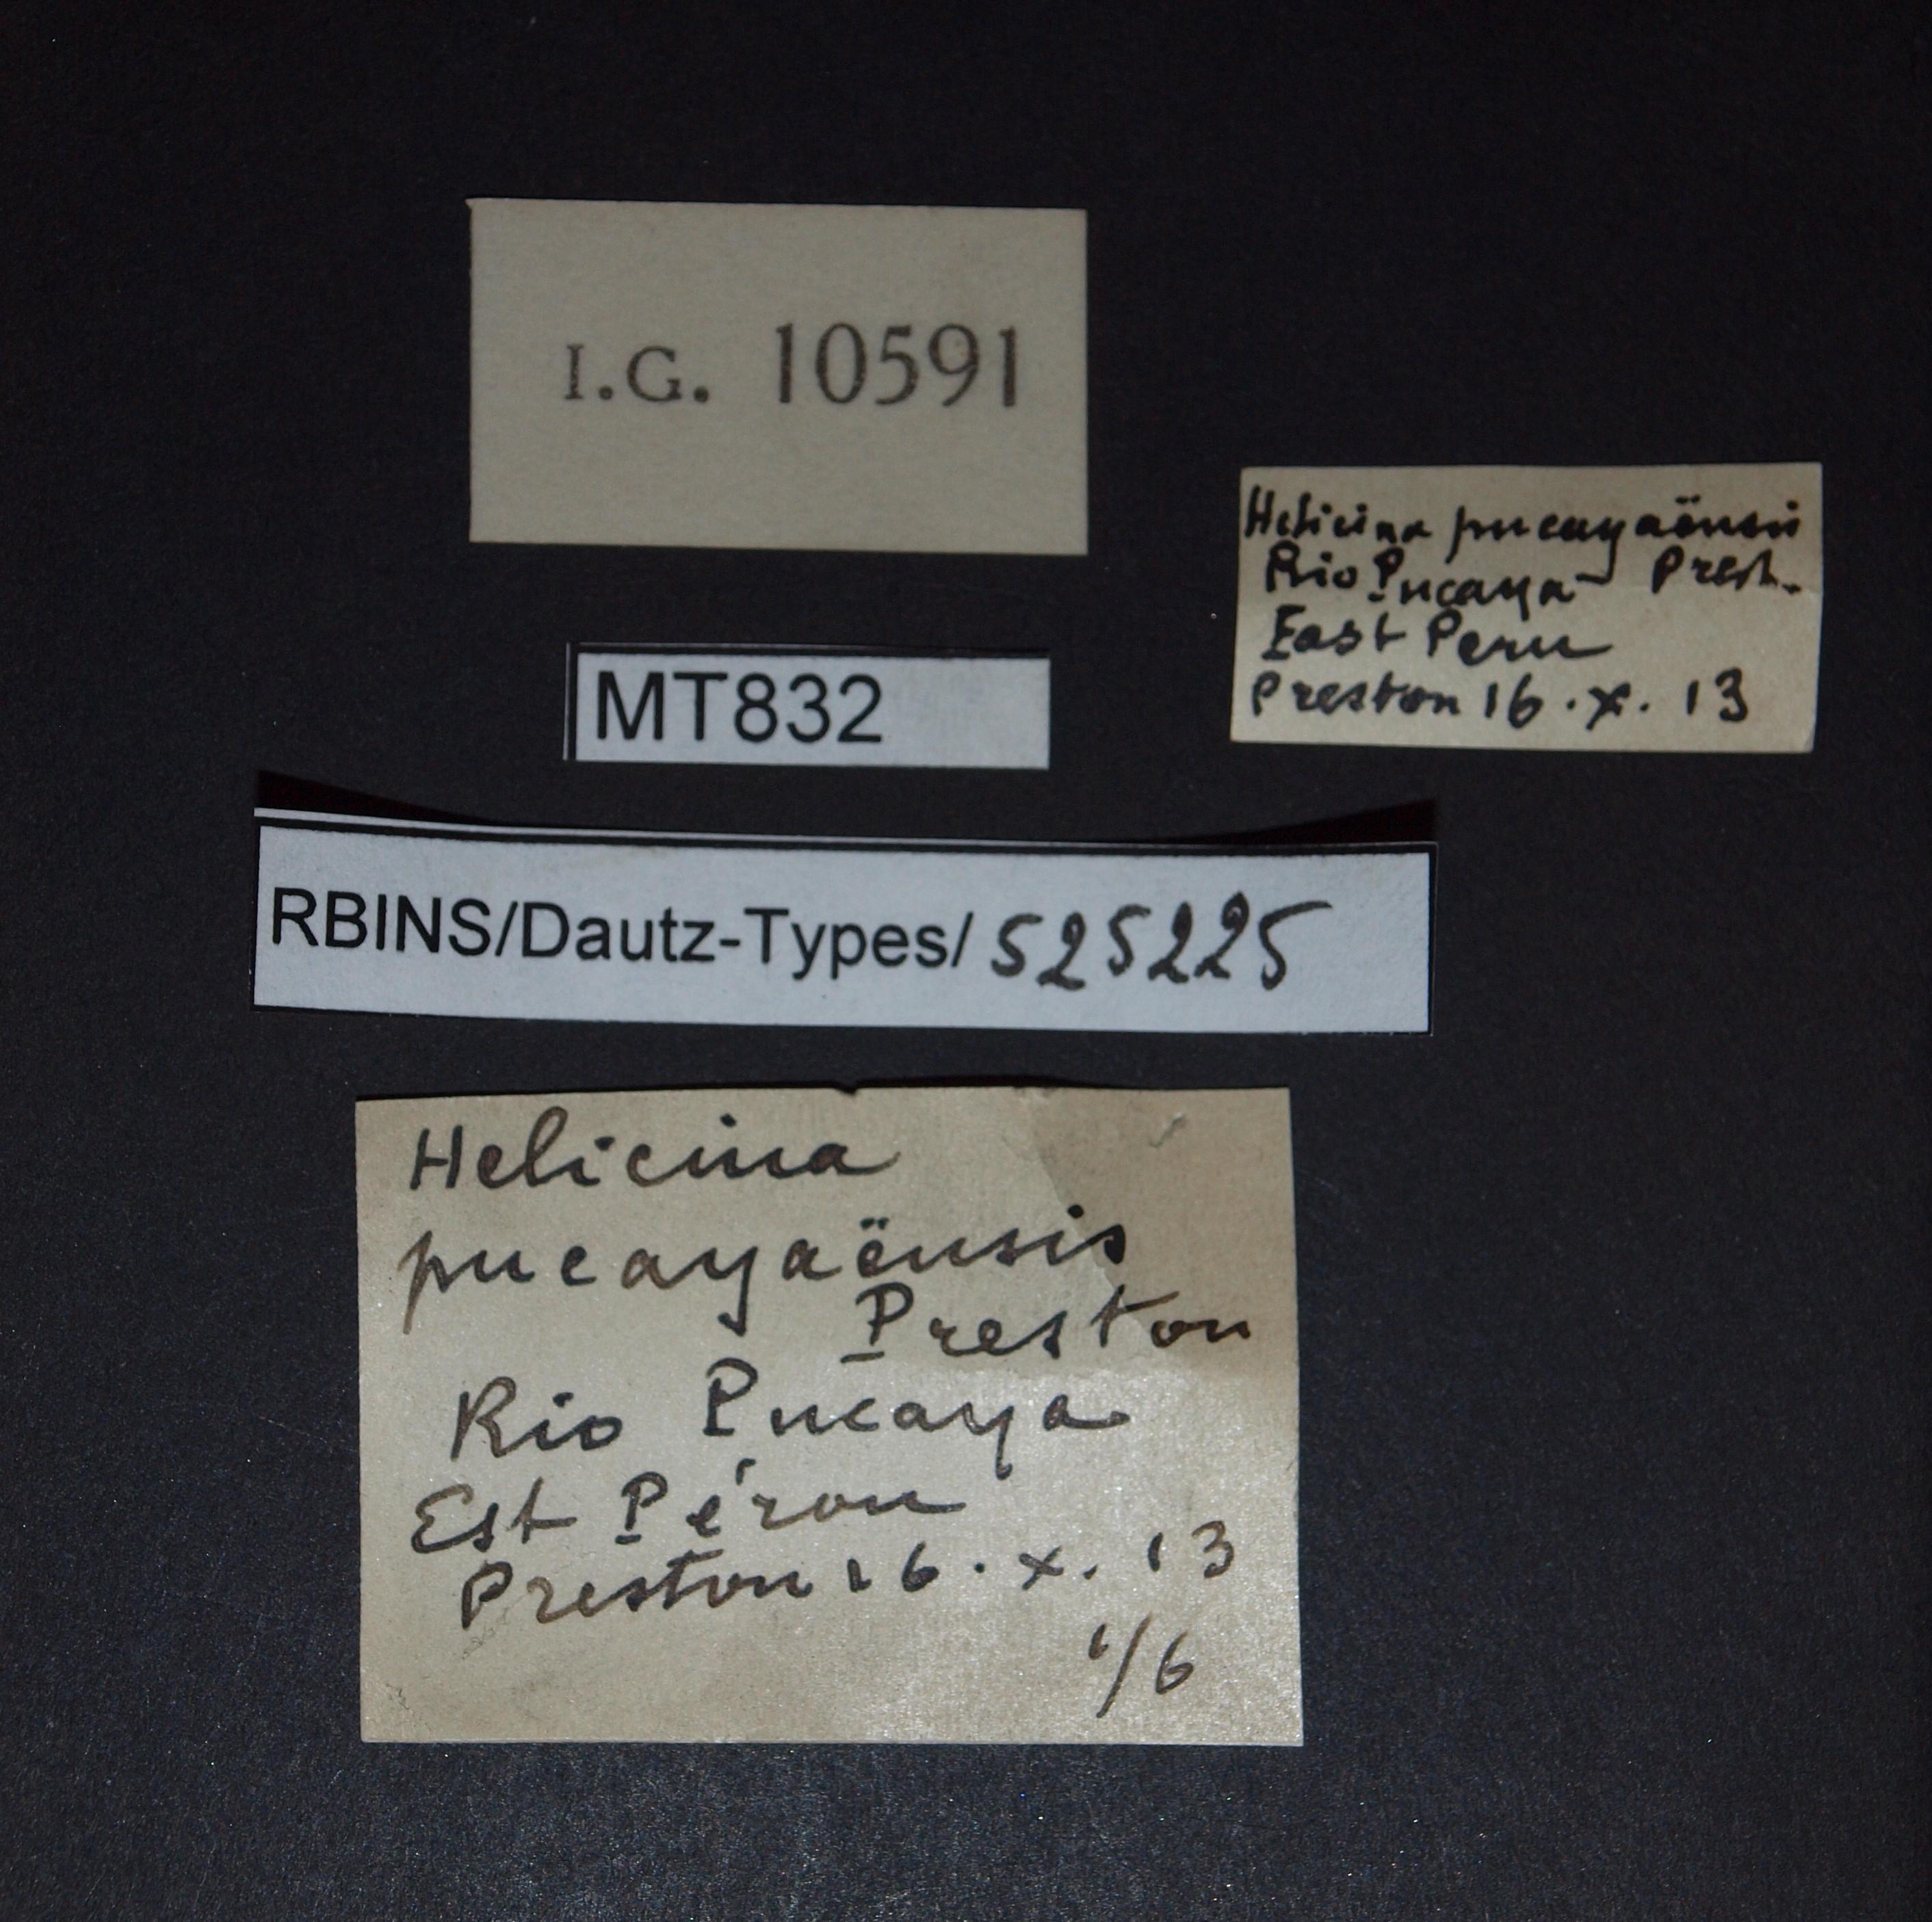 Helicina pucayaensis pt.JPG